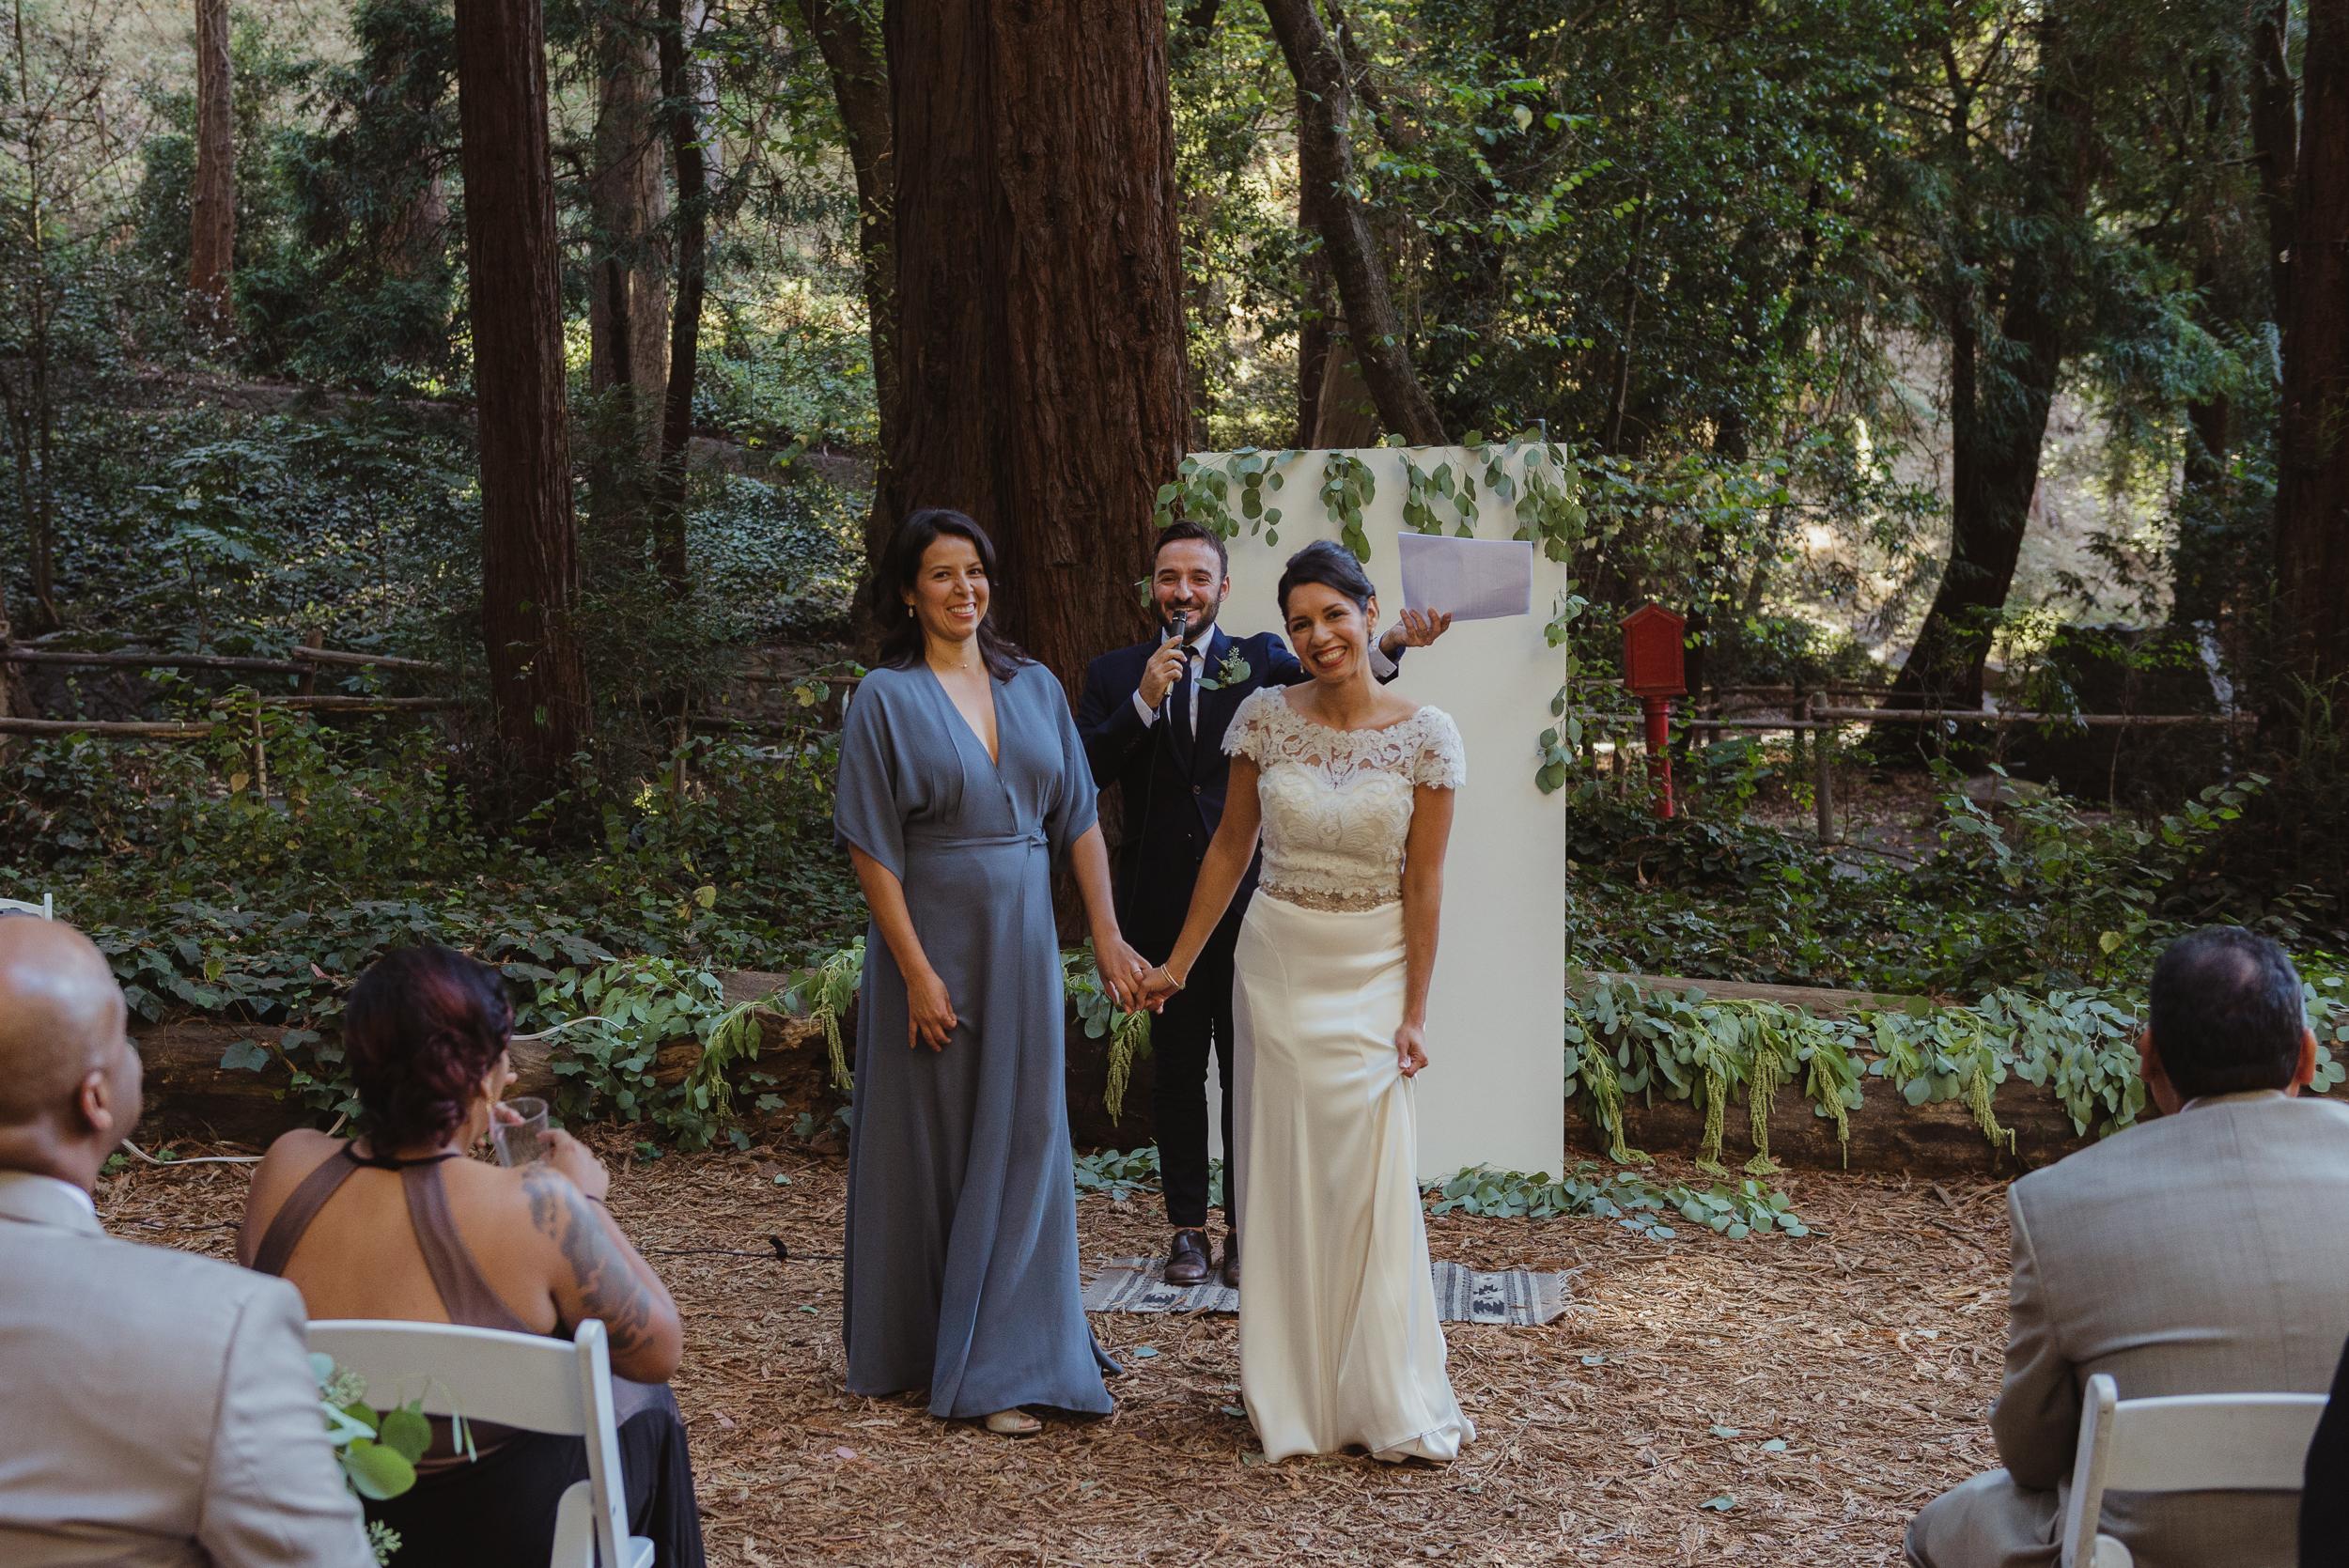 41san-francisco-stern-grove-wedding-photographer-vivianchen-276.jpg